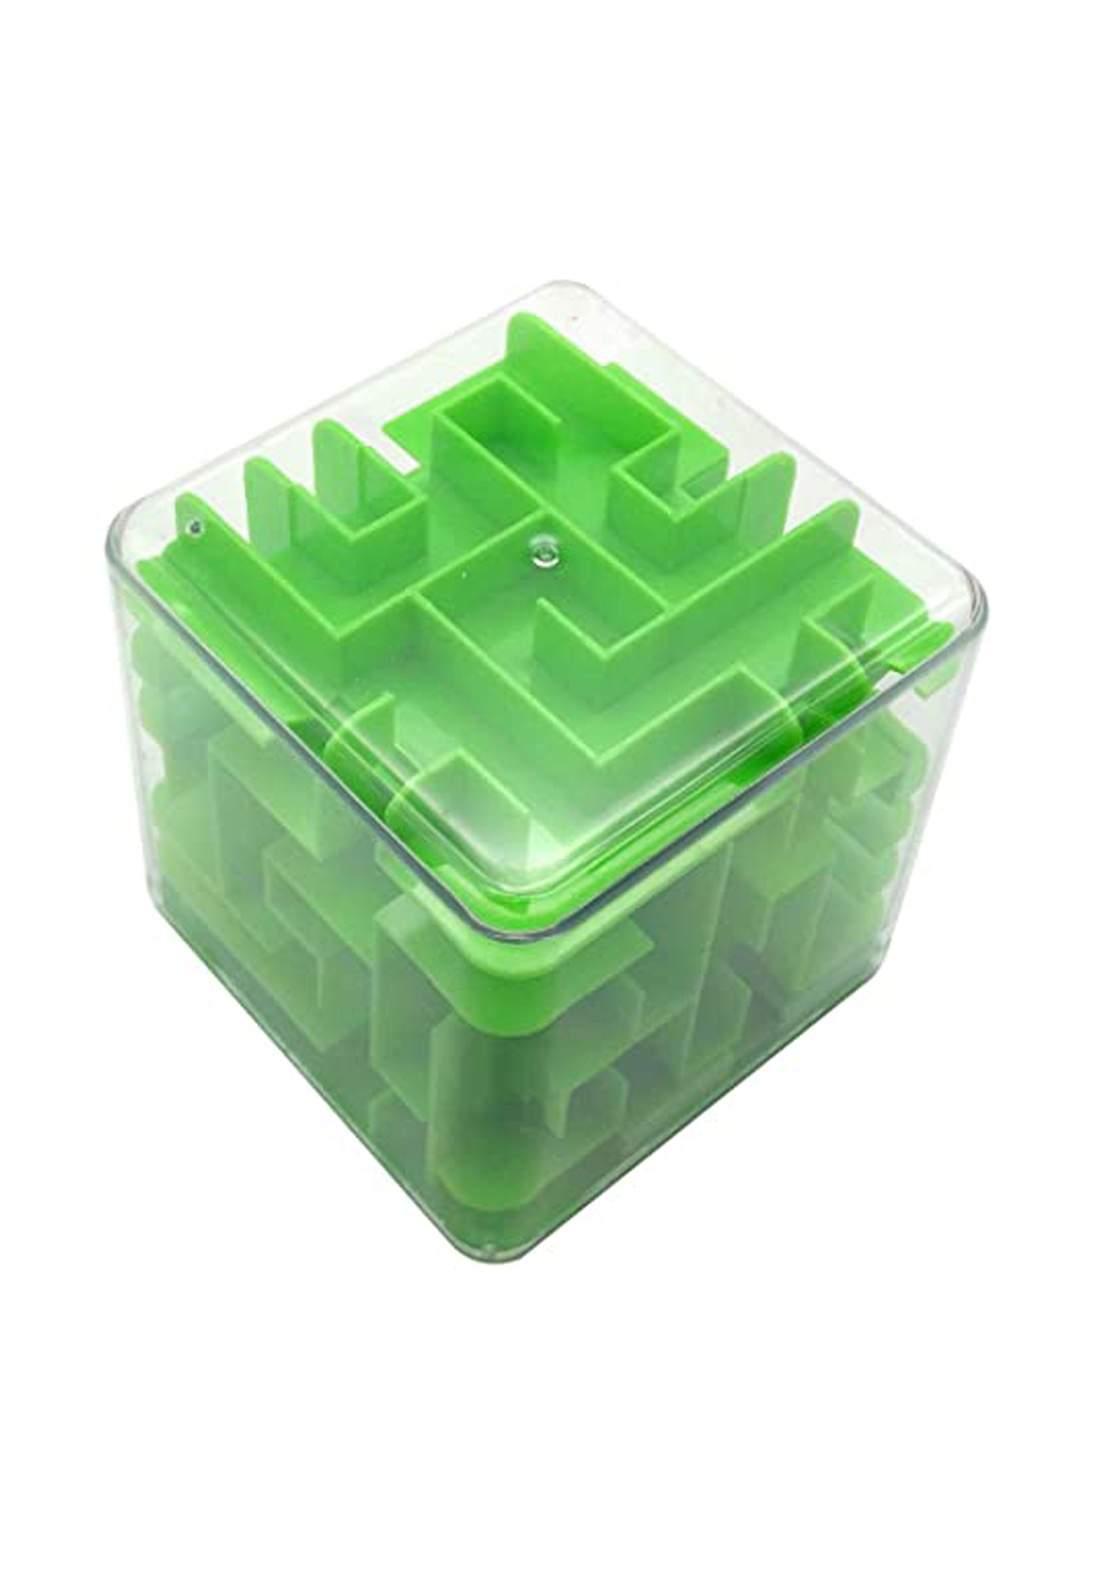 3D Maze Magic Speed Cube Puzzle Game لعبة مكعب المتاهة